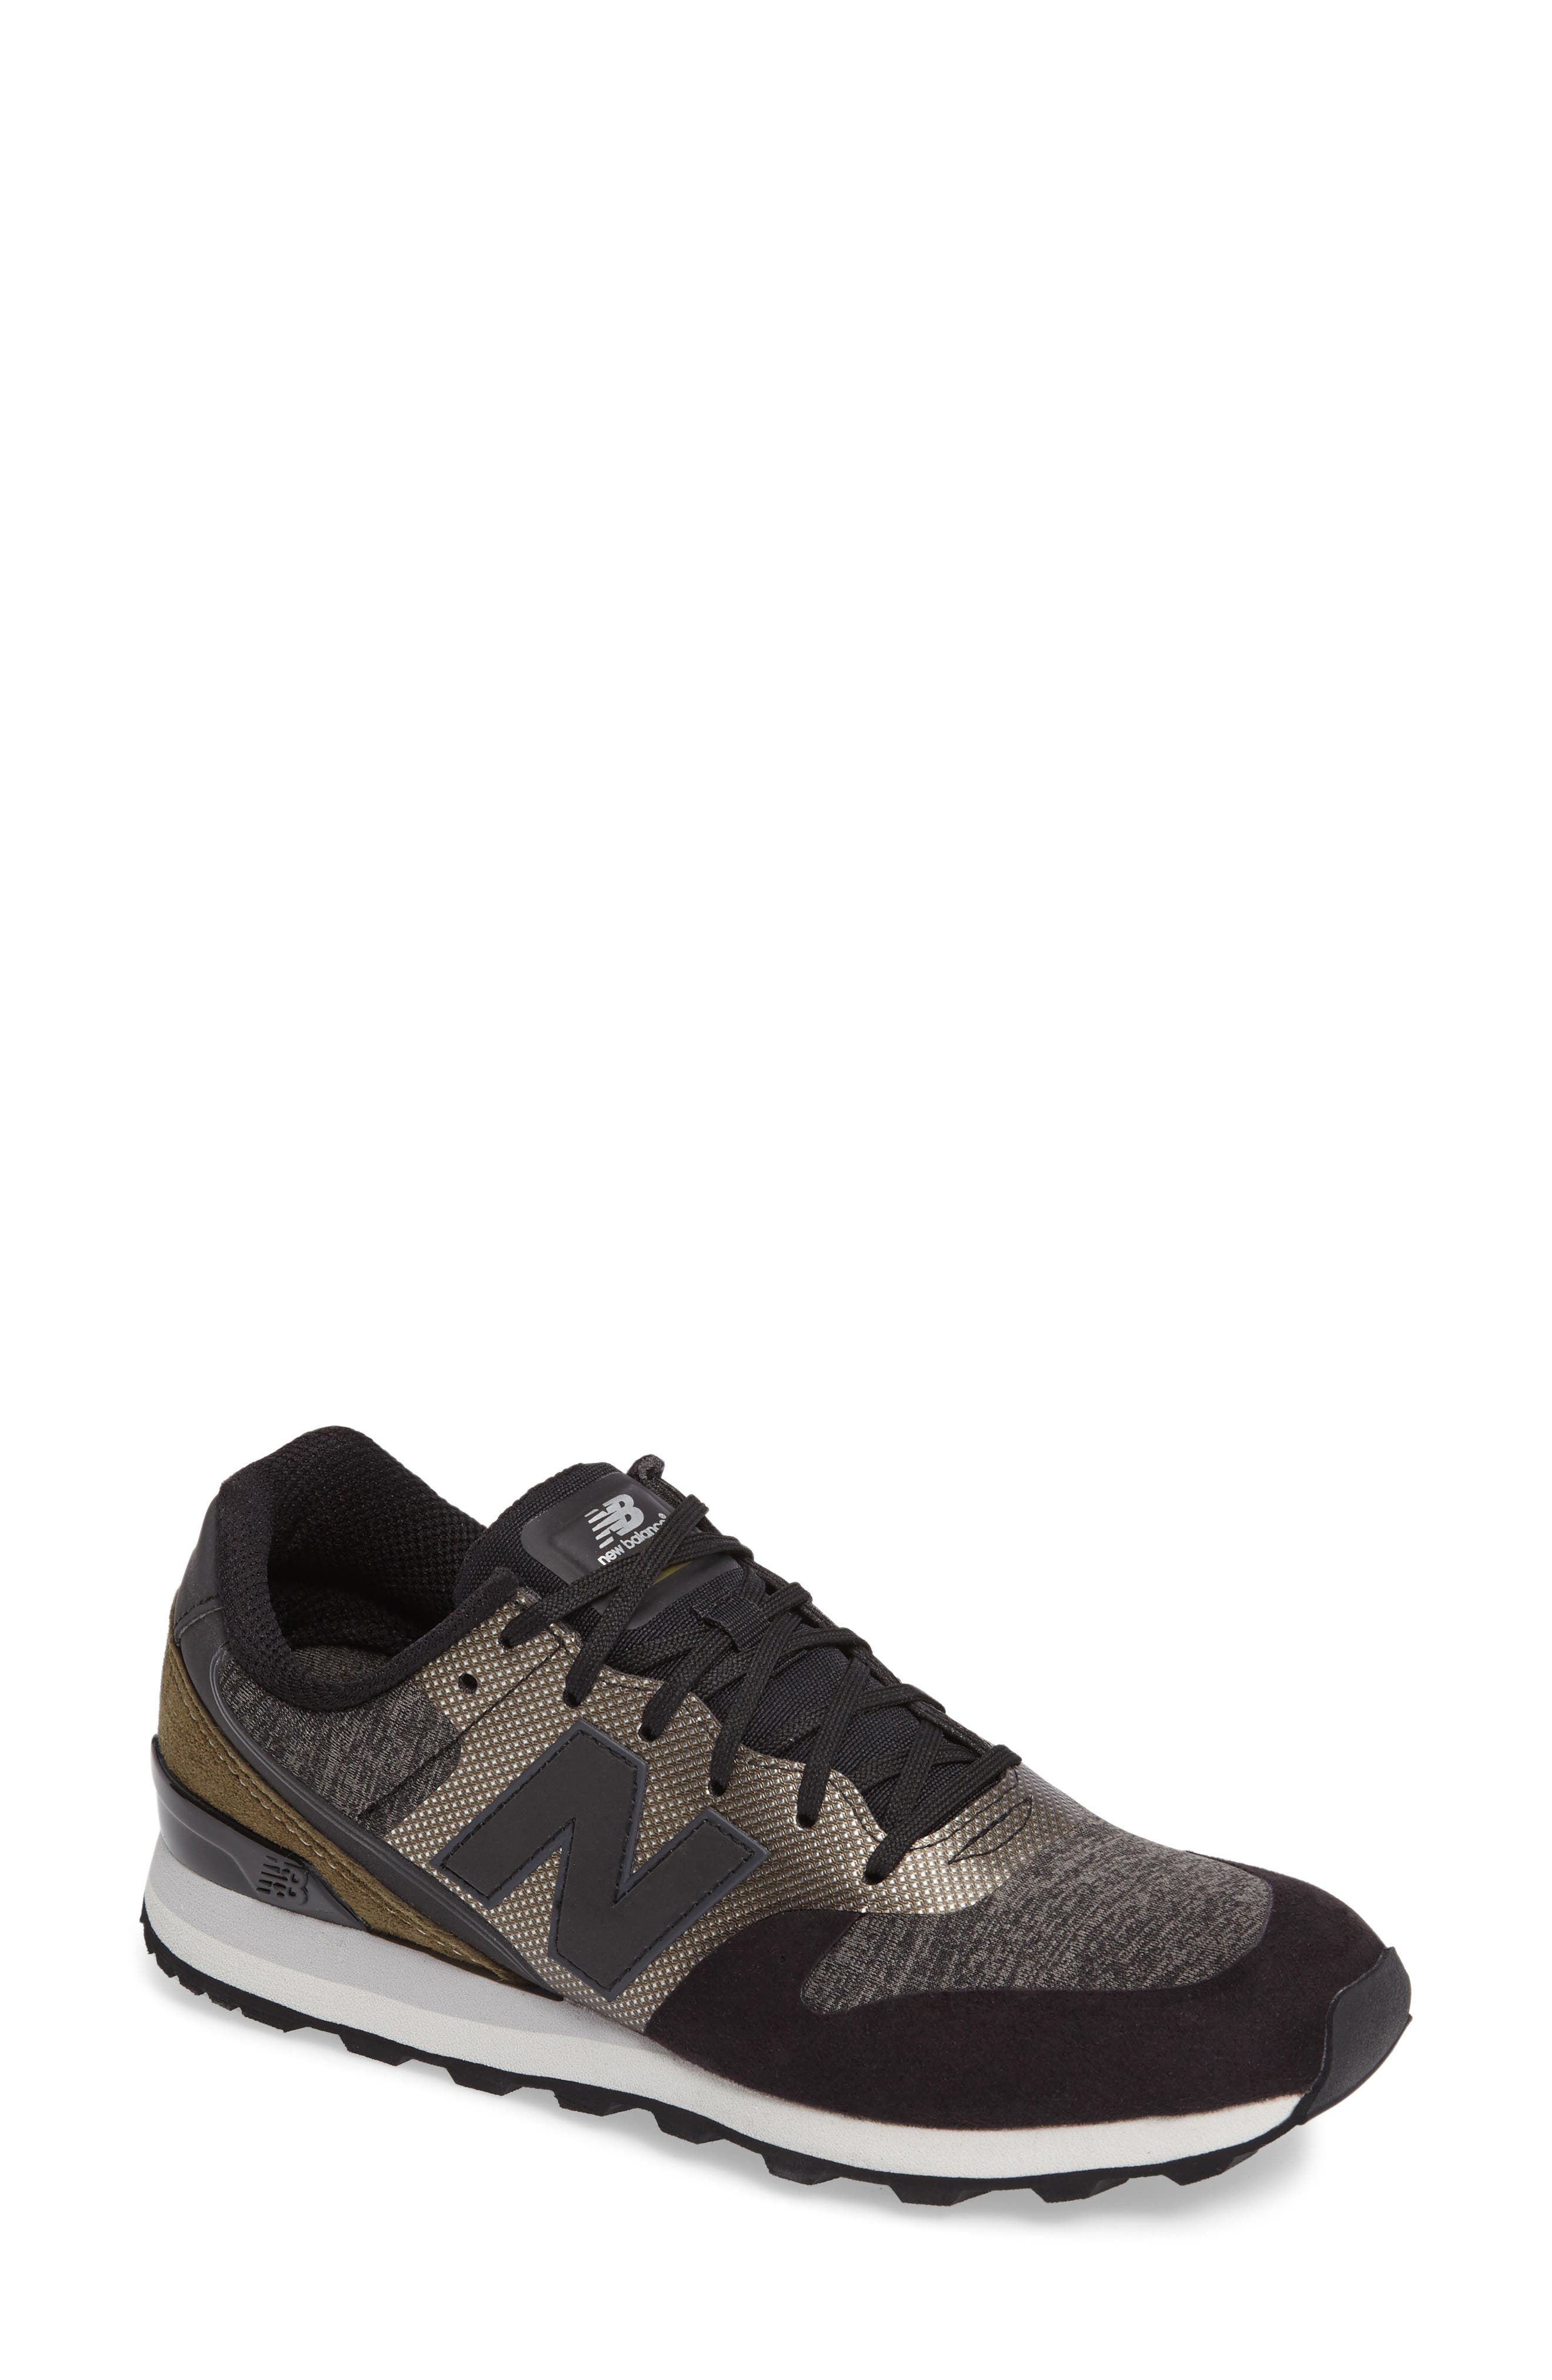 696 Re-Engineered Sneaker,                         Main,                         color, 030